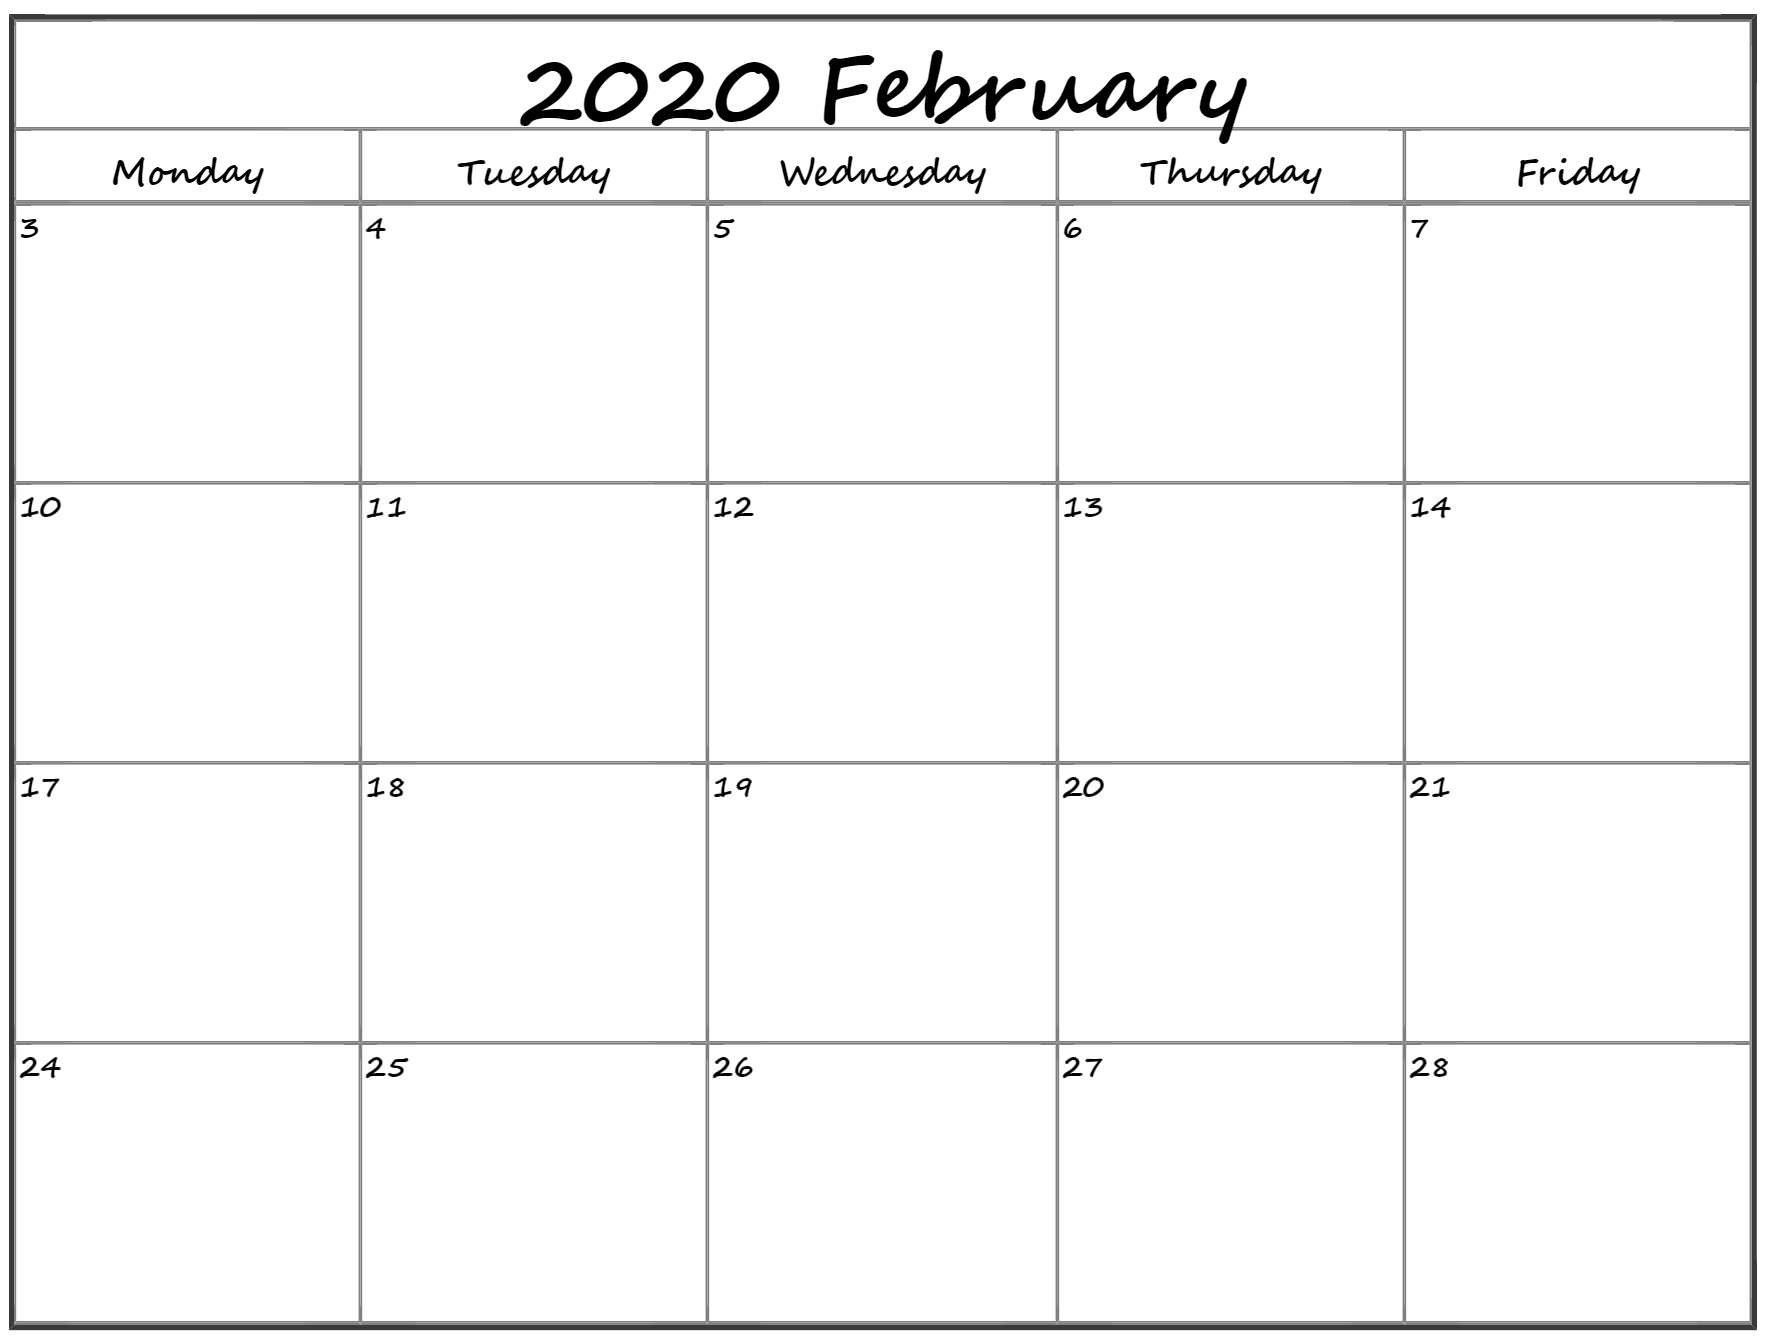 February 2020 Monday Calendar | Monday To Sunday Monday To Friday Calendar Printable